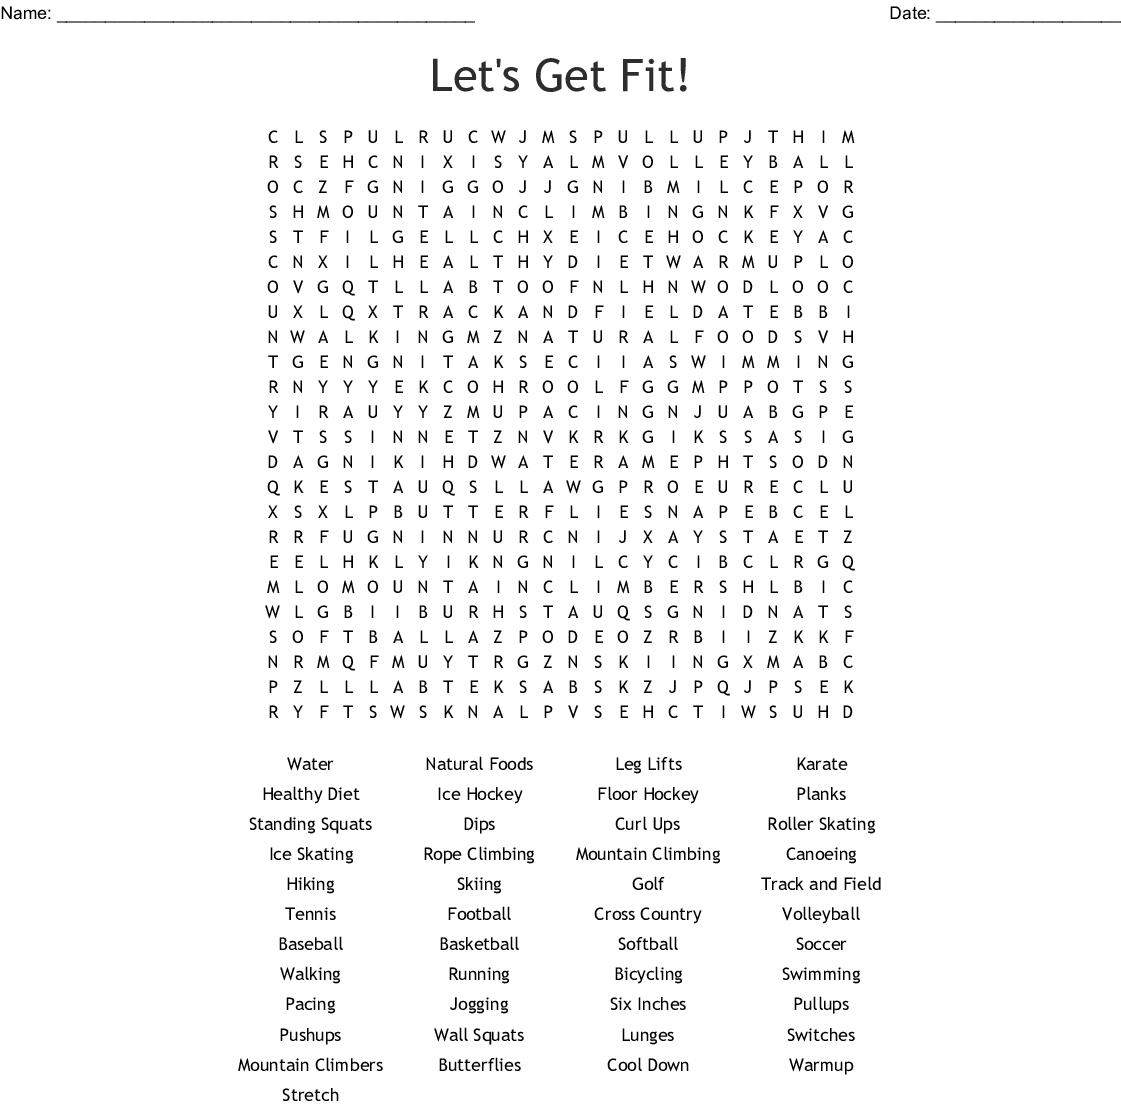 Grade 8 Word Search